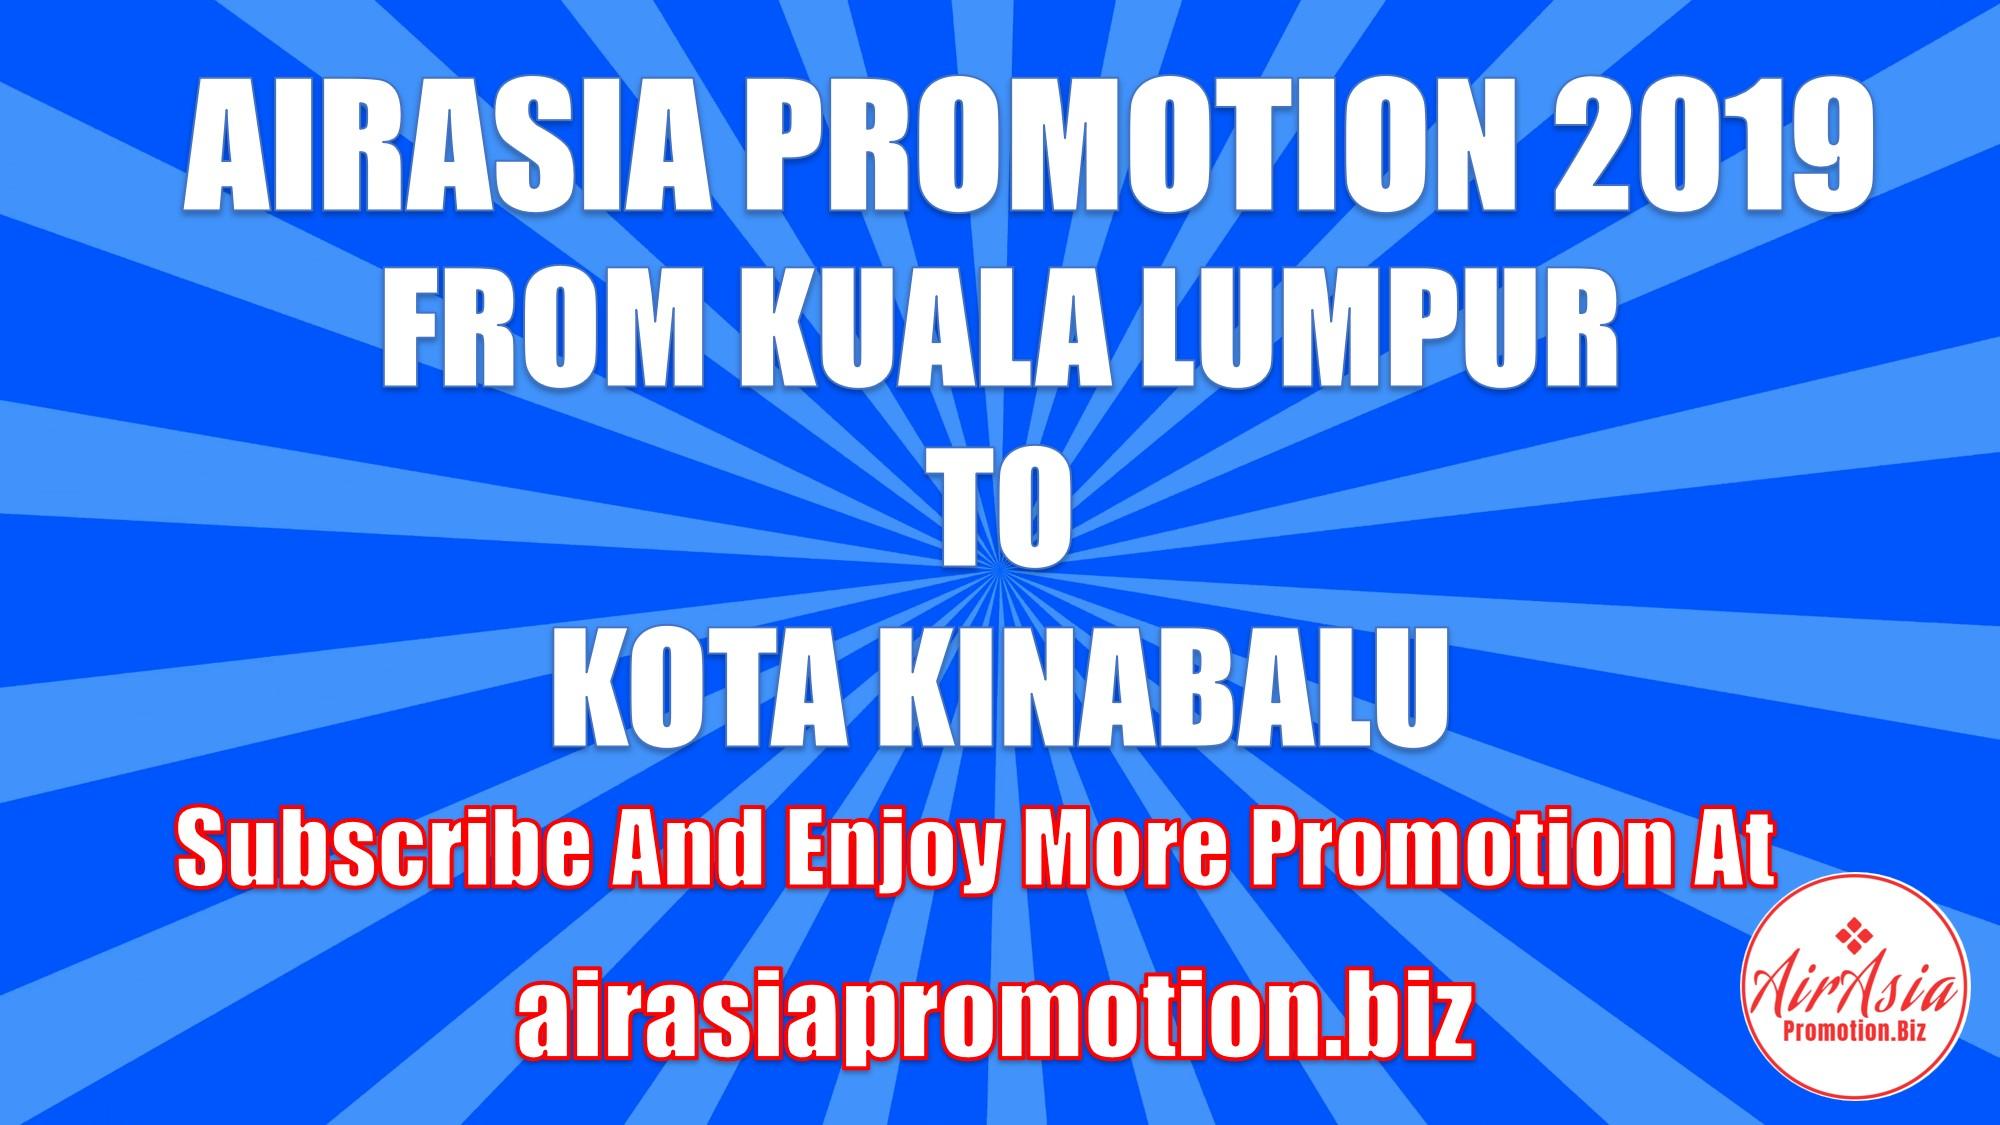 AirAsia Promotion From Kuala Lumpur To Kota Kinabalu In March 2019